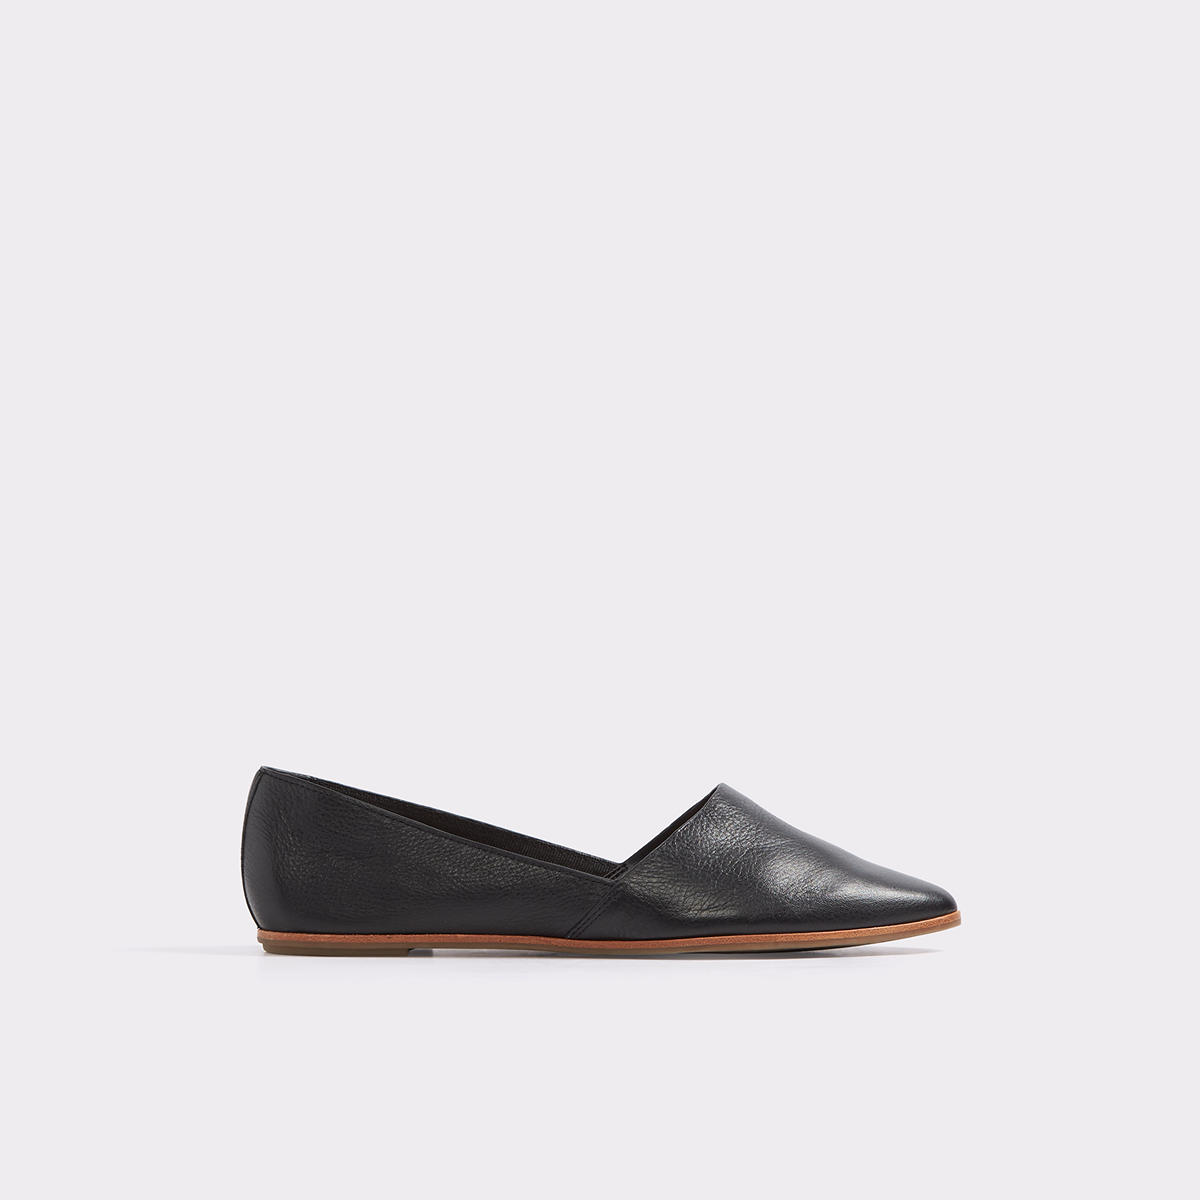 Blanchette Black Women's Oxfords & loafers | ALDO US at Aldo Shoes in Victor, NY | Tuggl